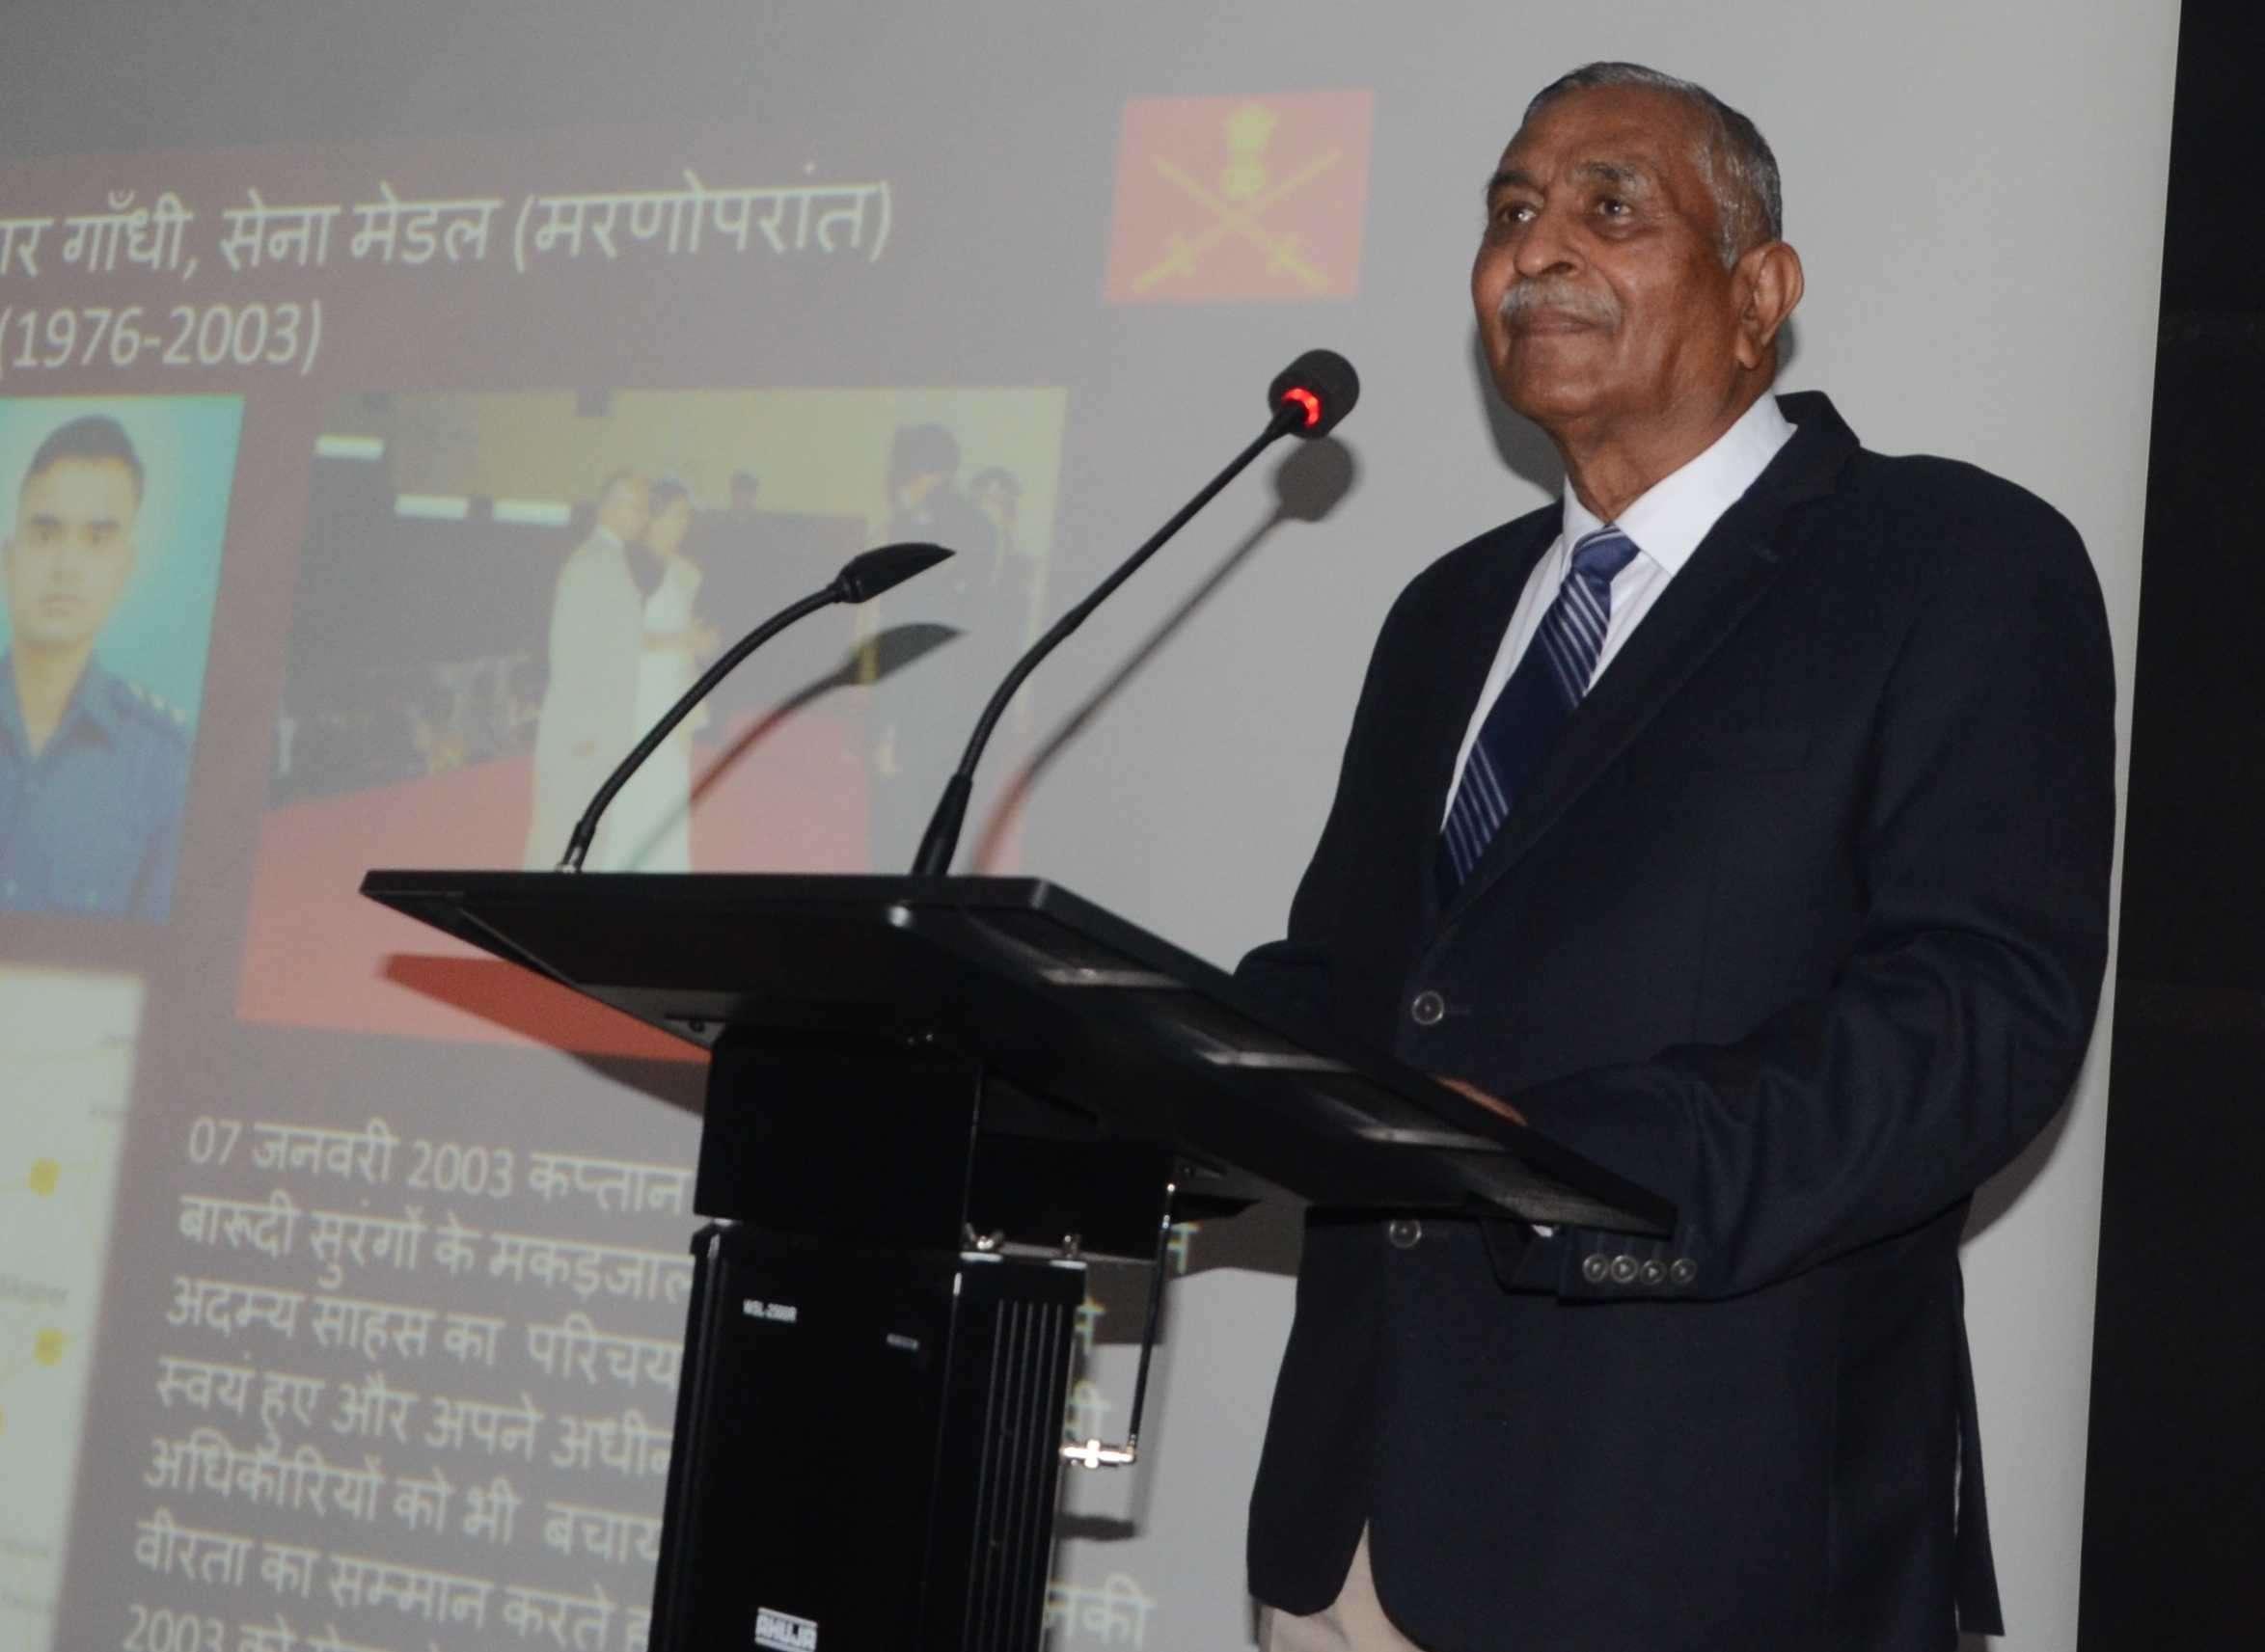 Martyrdom day special of captain shreyansh gandhi